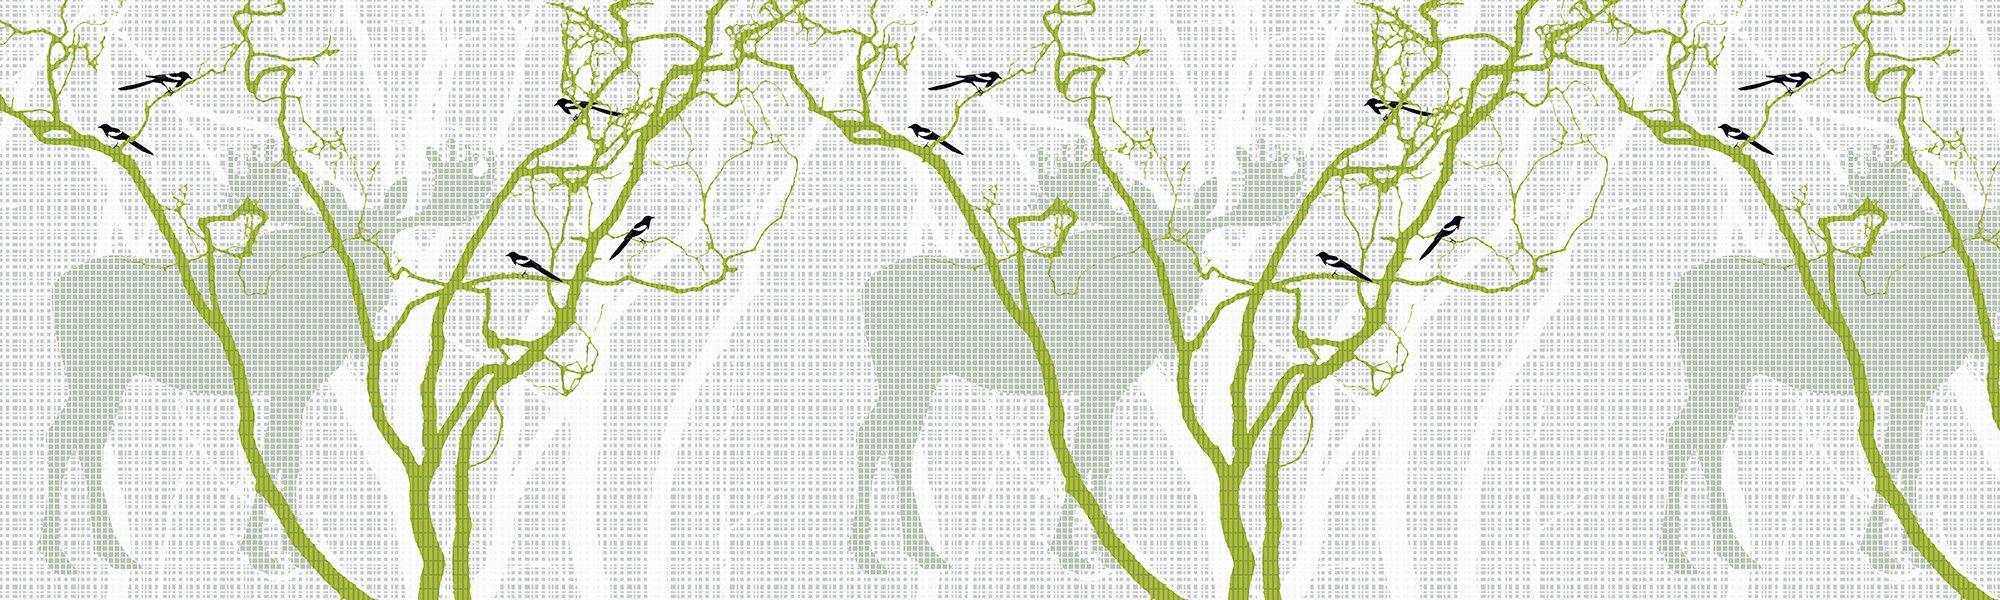 rhubarb spring green wall mural photo wallpaper photowall rhubarb spring green wall mural photo wallpaper photowall